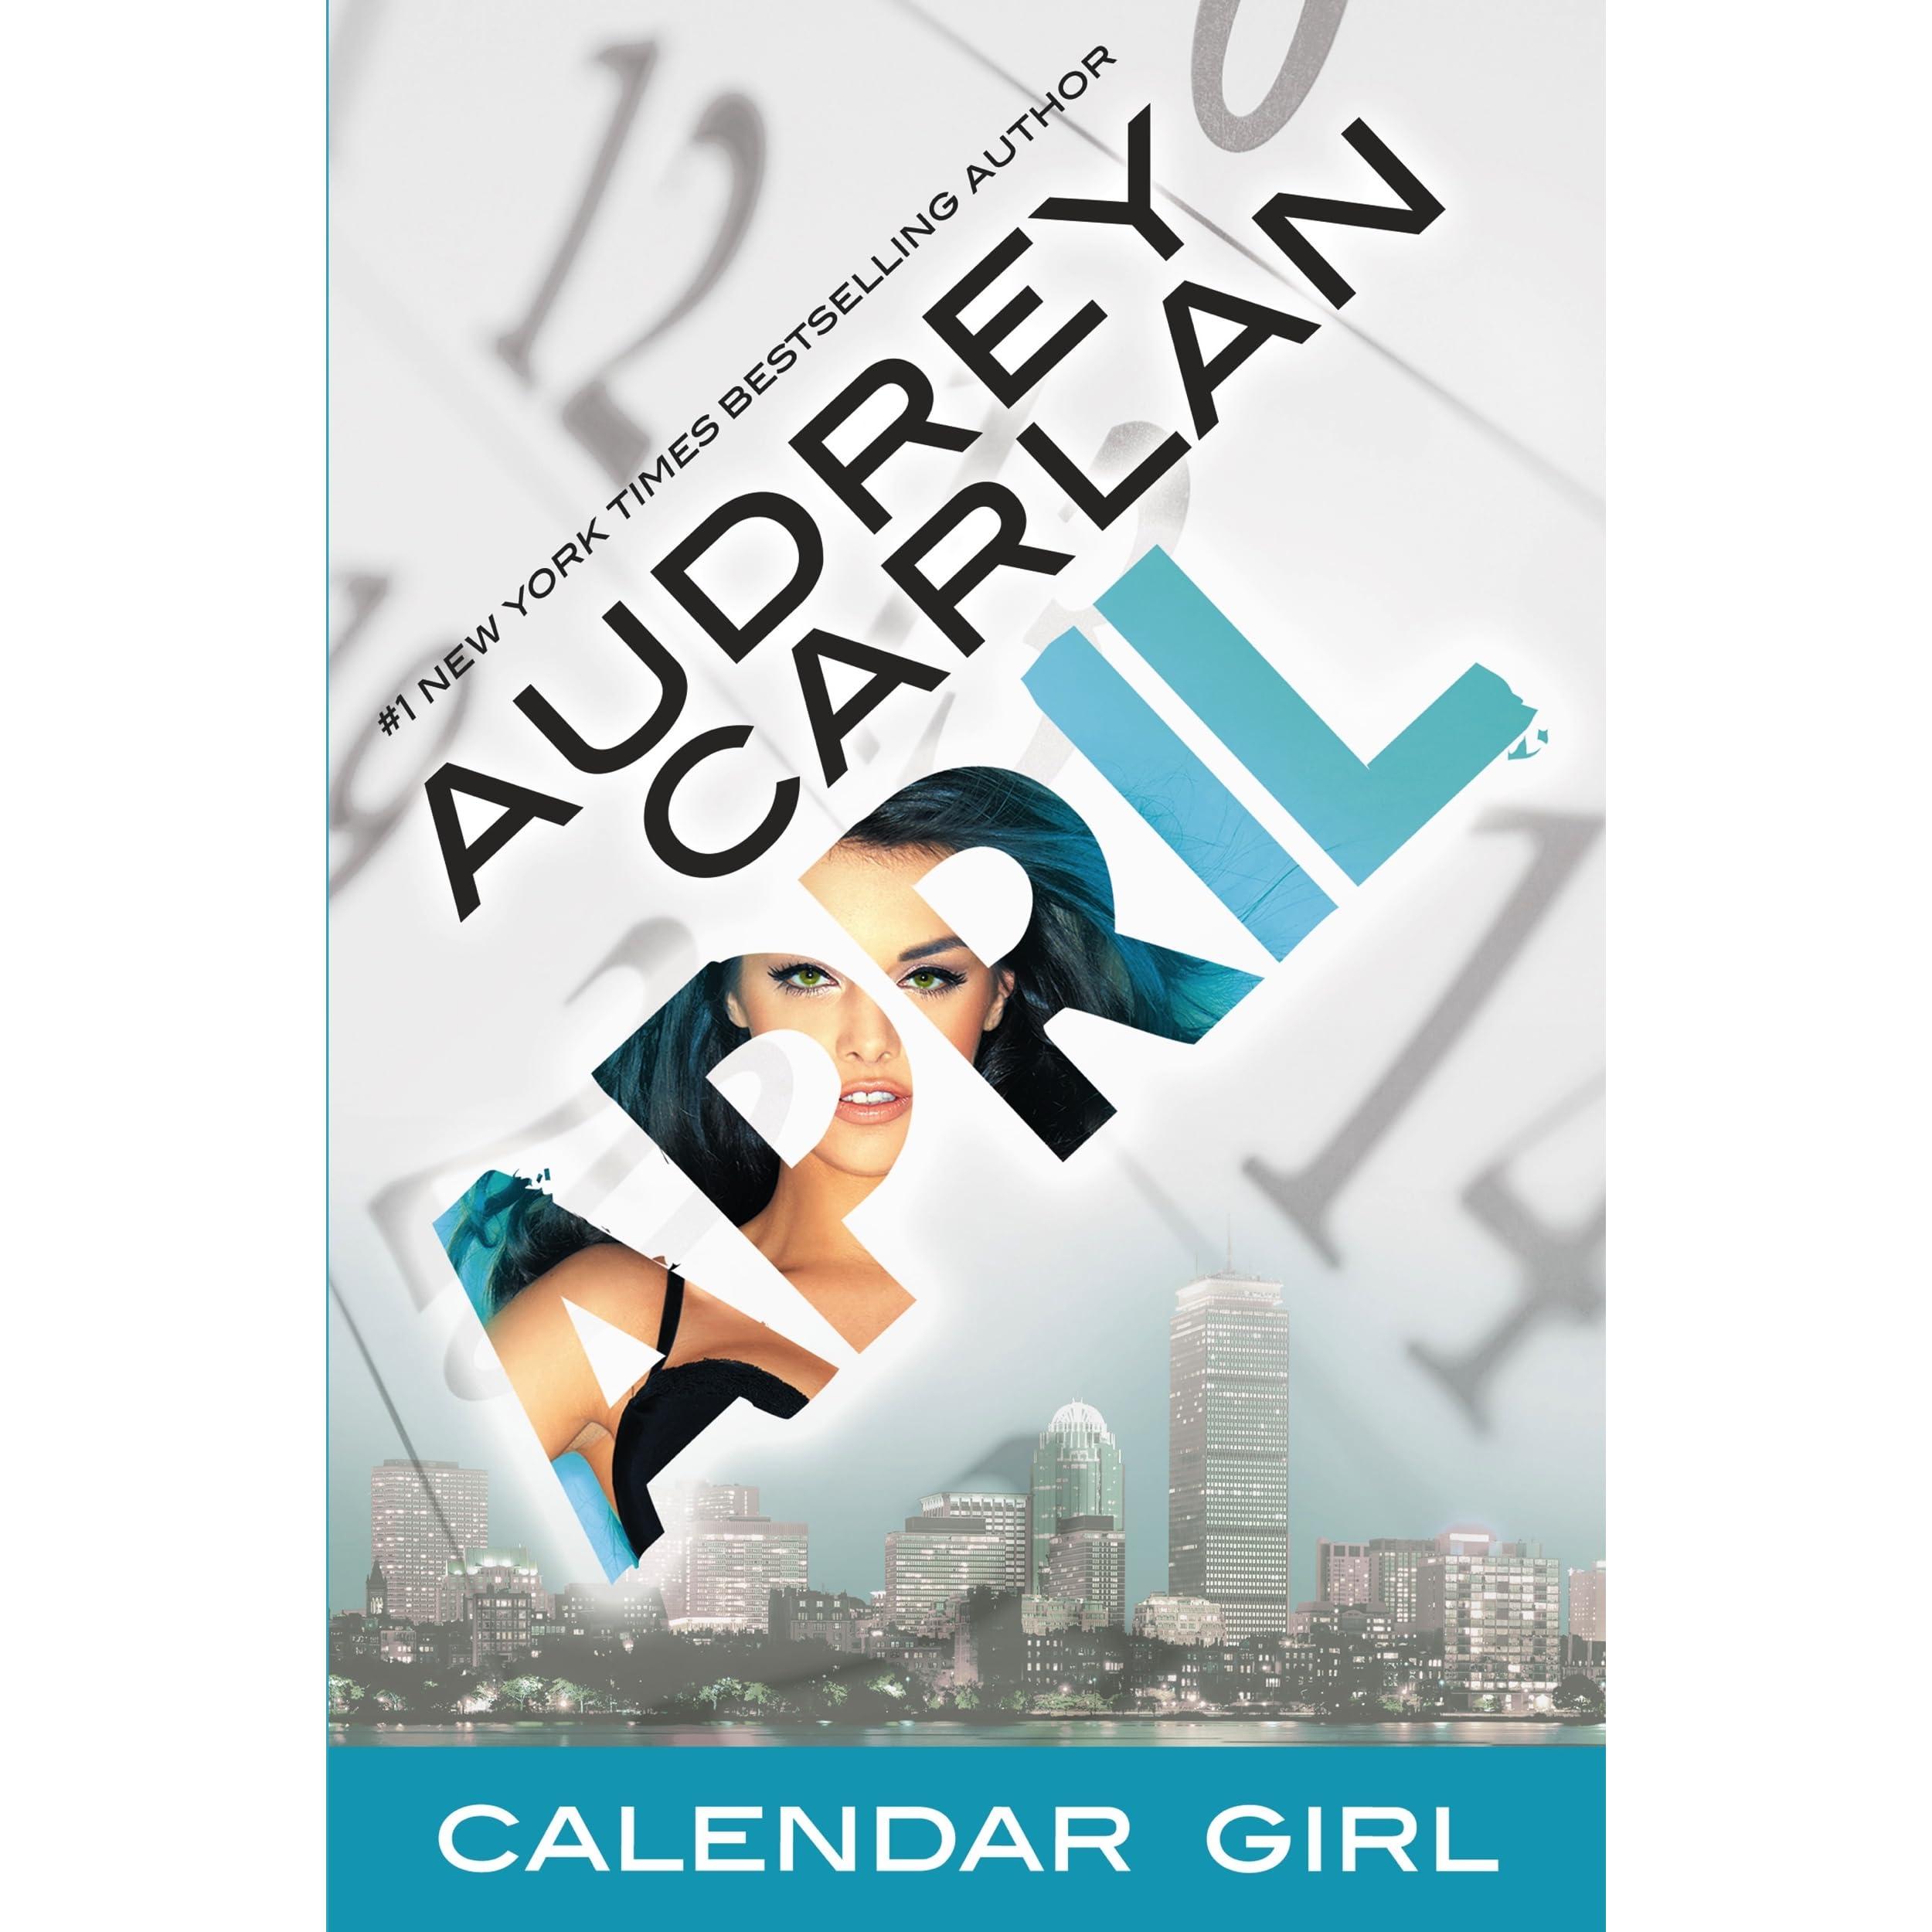 Calendar Mysteries April Adventure Quiz : April calendar girl by audrey carlan — reviews